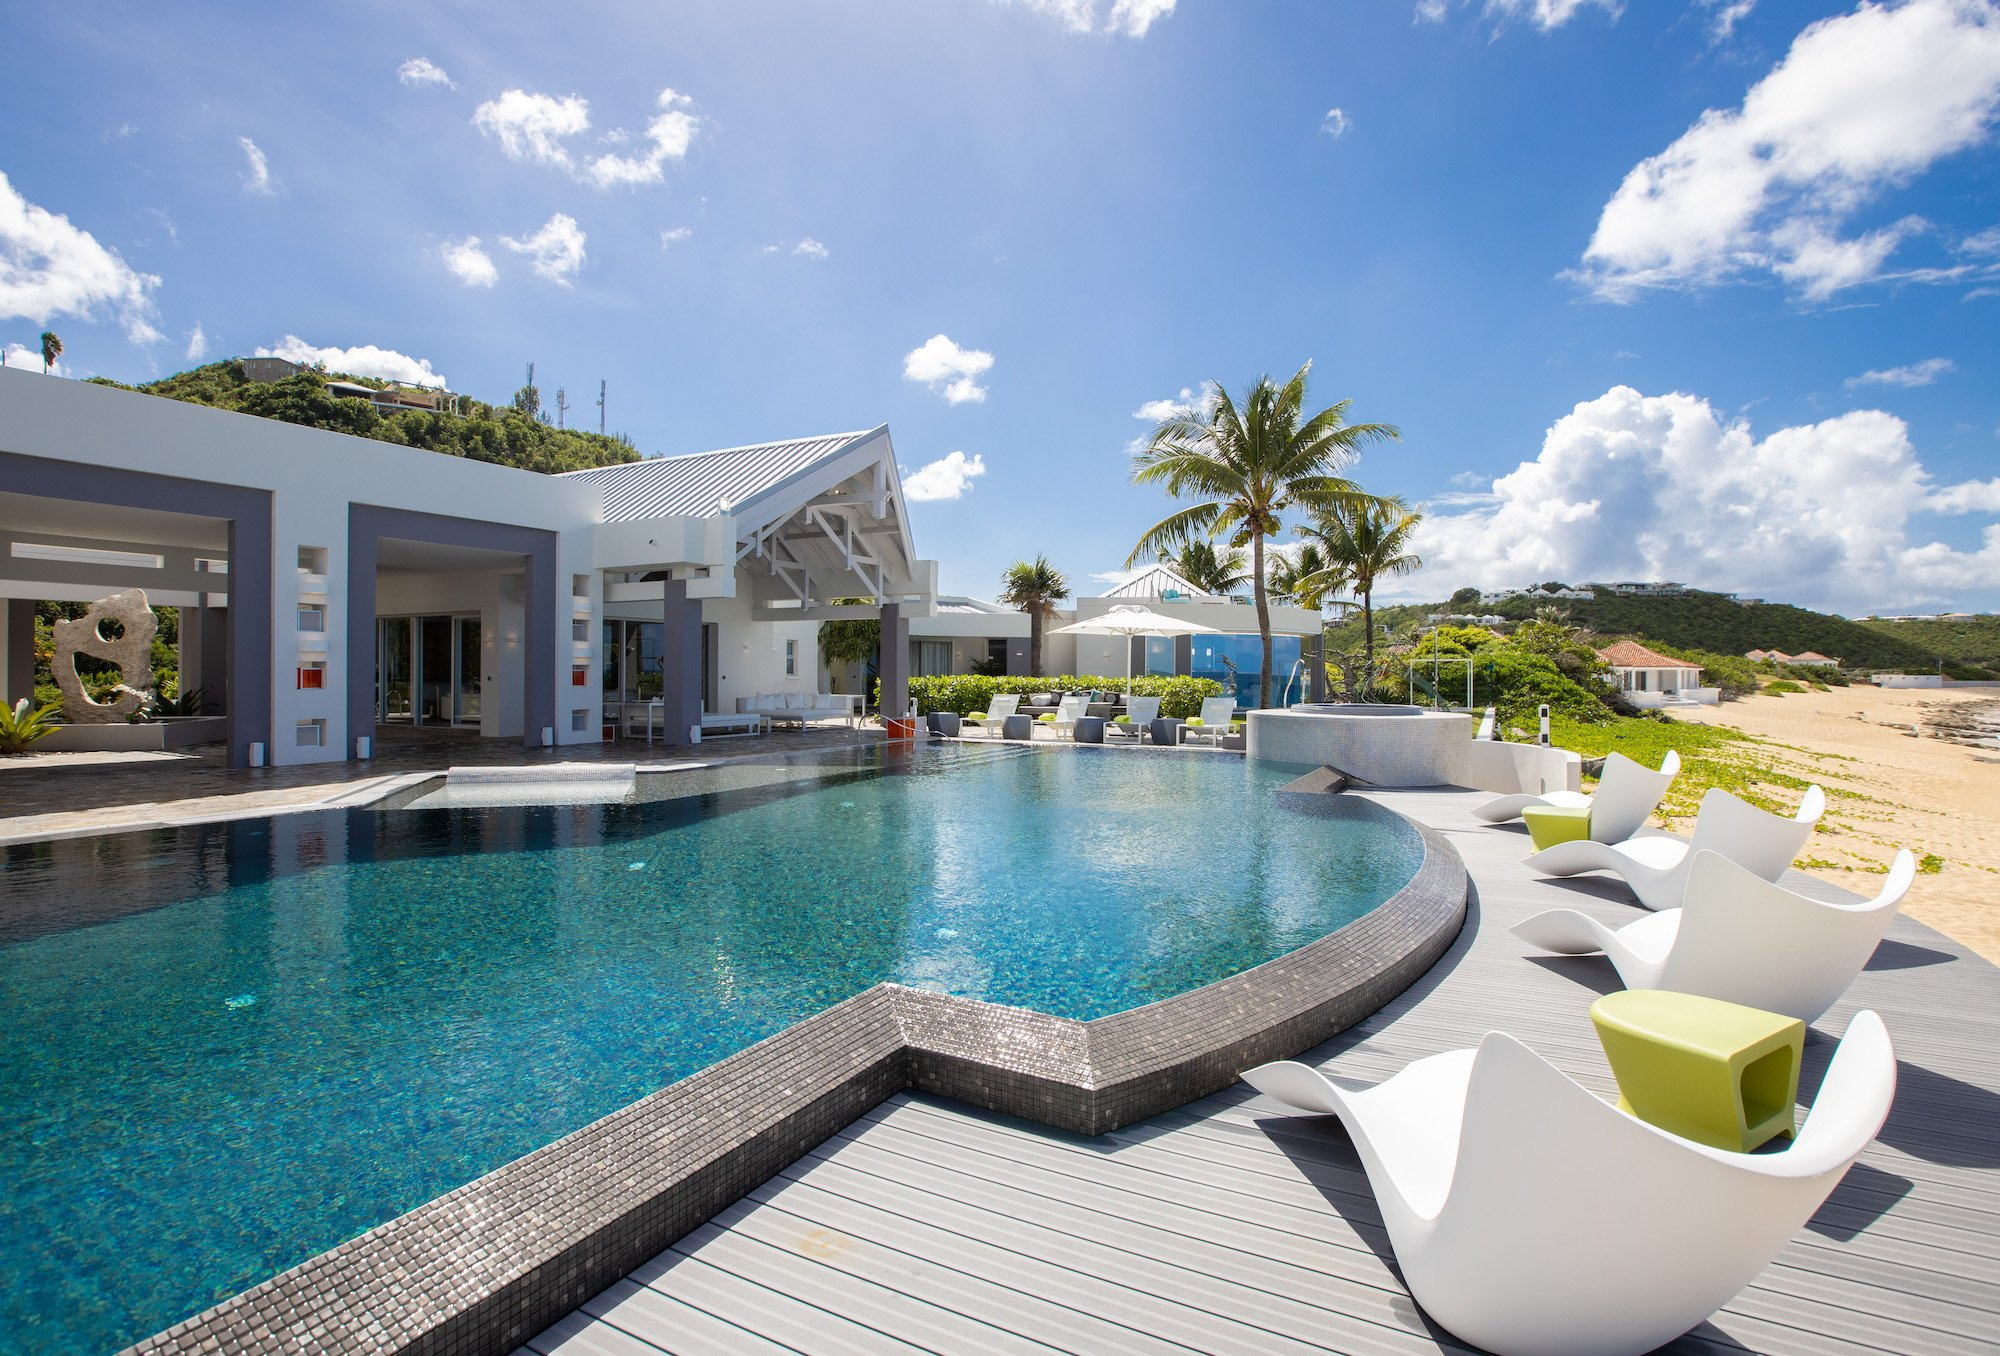 Luxury villa rentals caribbean - St martin - Saint martin french - Les terres basses - Villa Le Rêve - Image 1/69